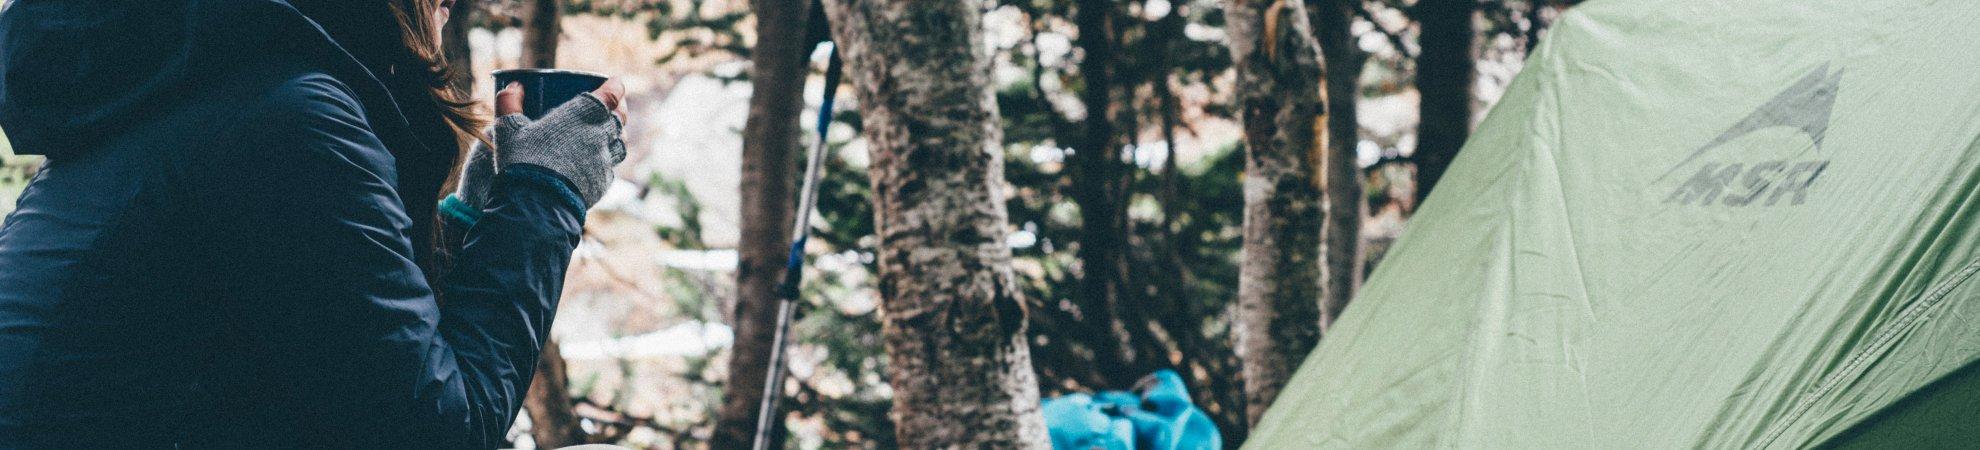 Best Camping Hacks